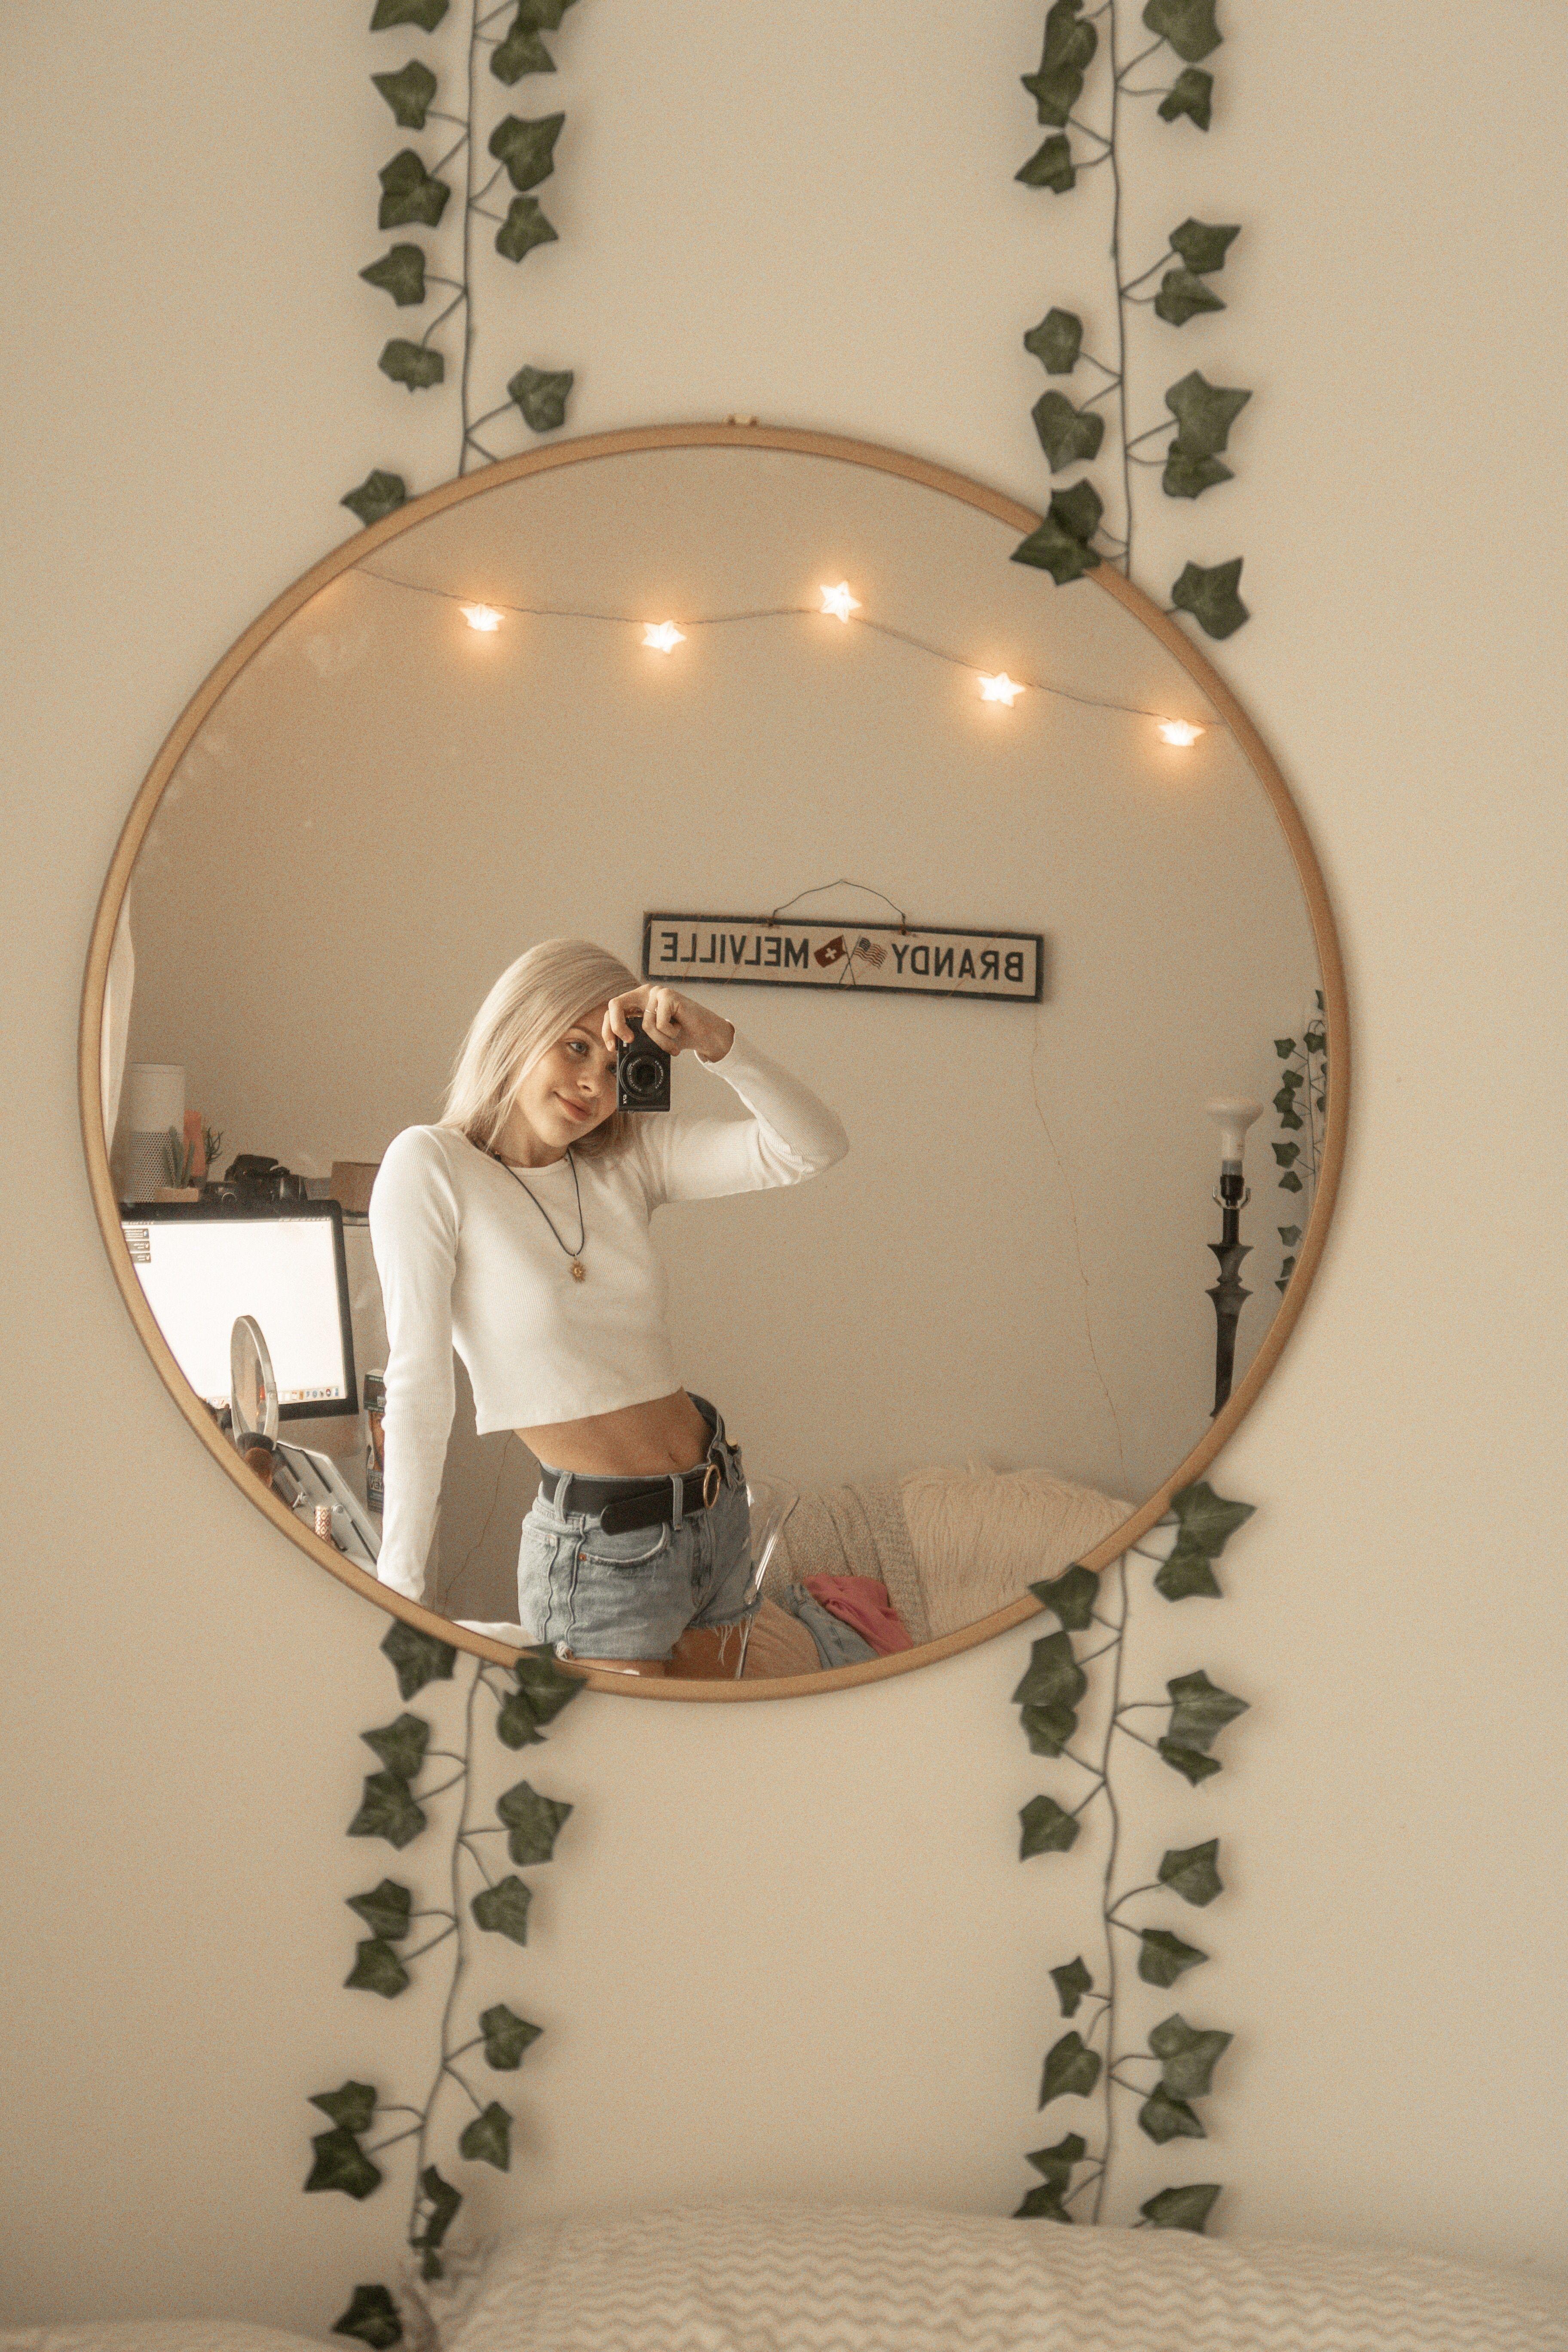 mirror selfie ootd inspo